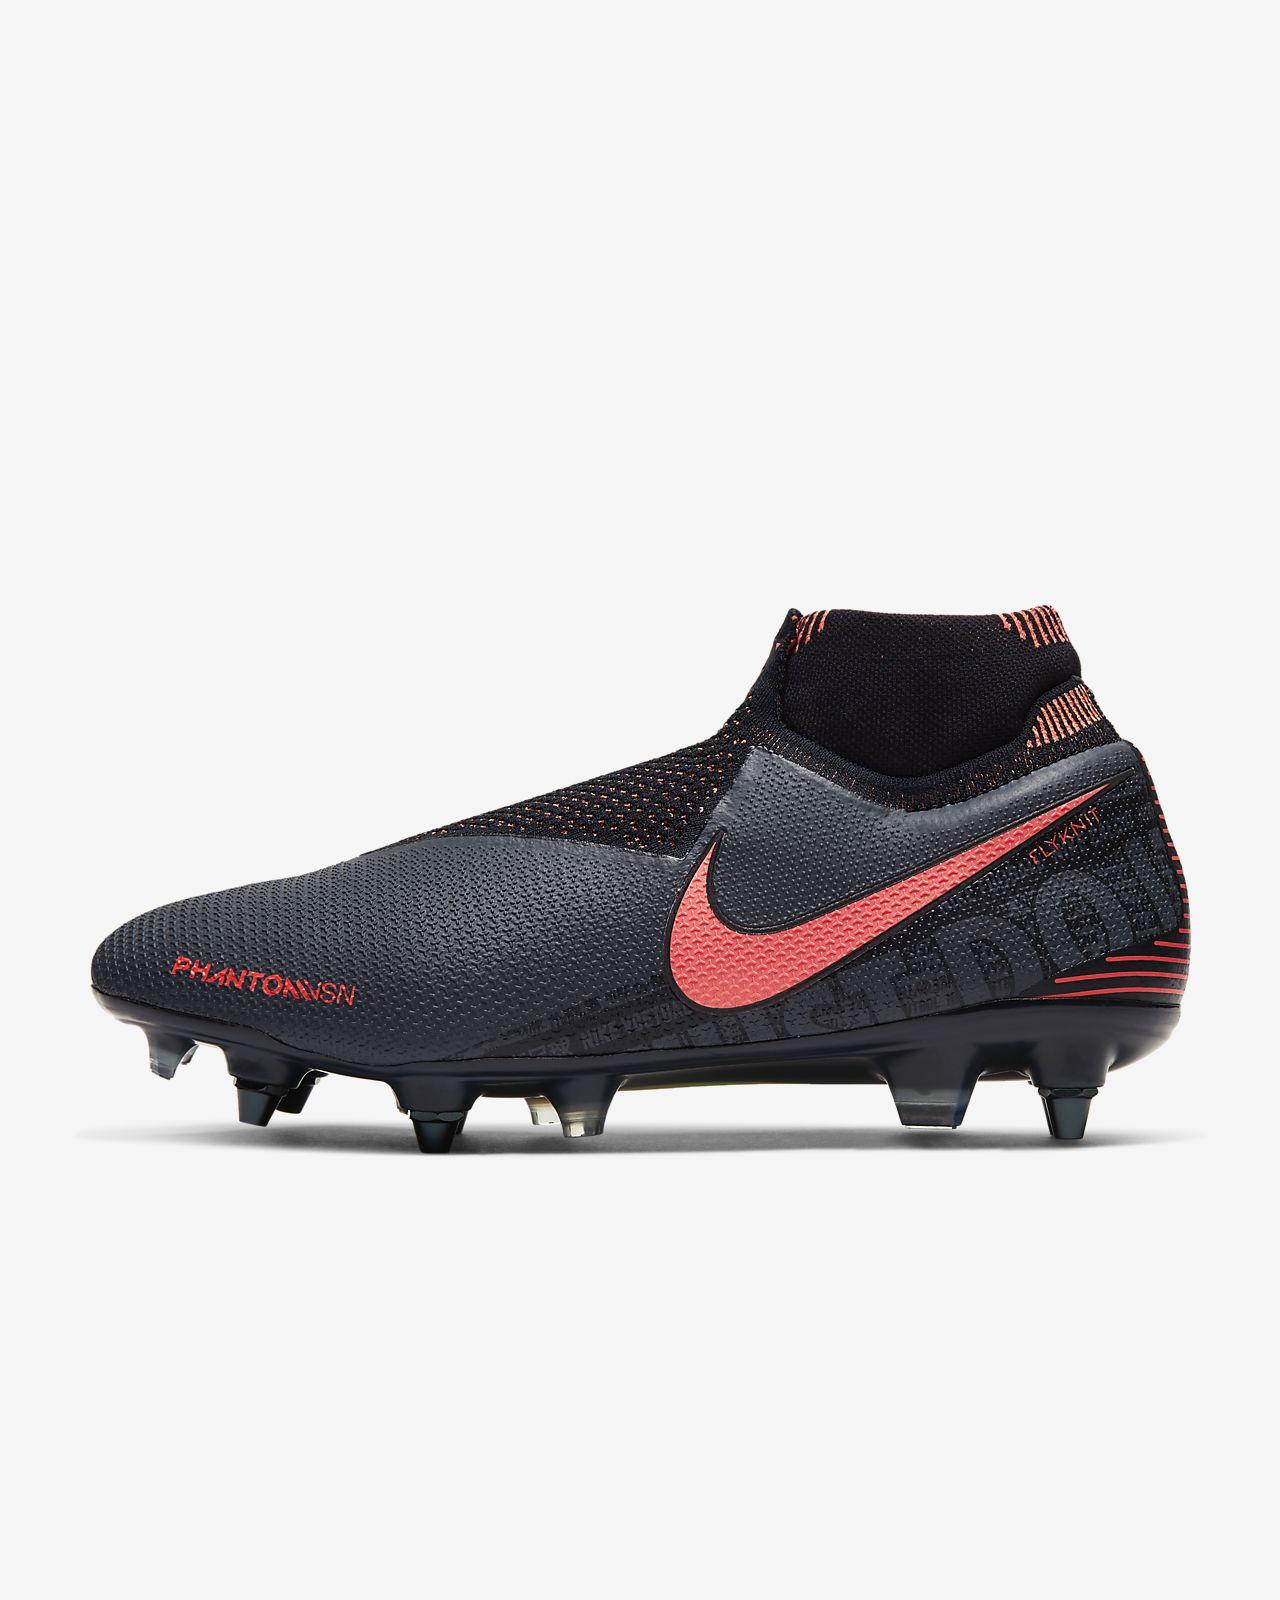 Atmungsaktive Männer Kinder Fußball Schuhe Lange Spikes Anti